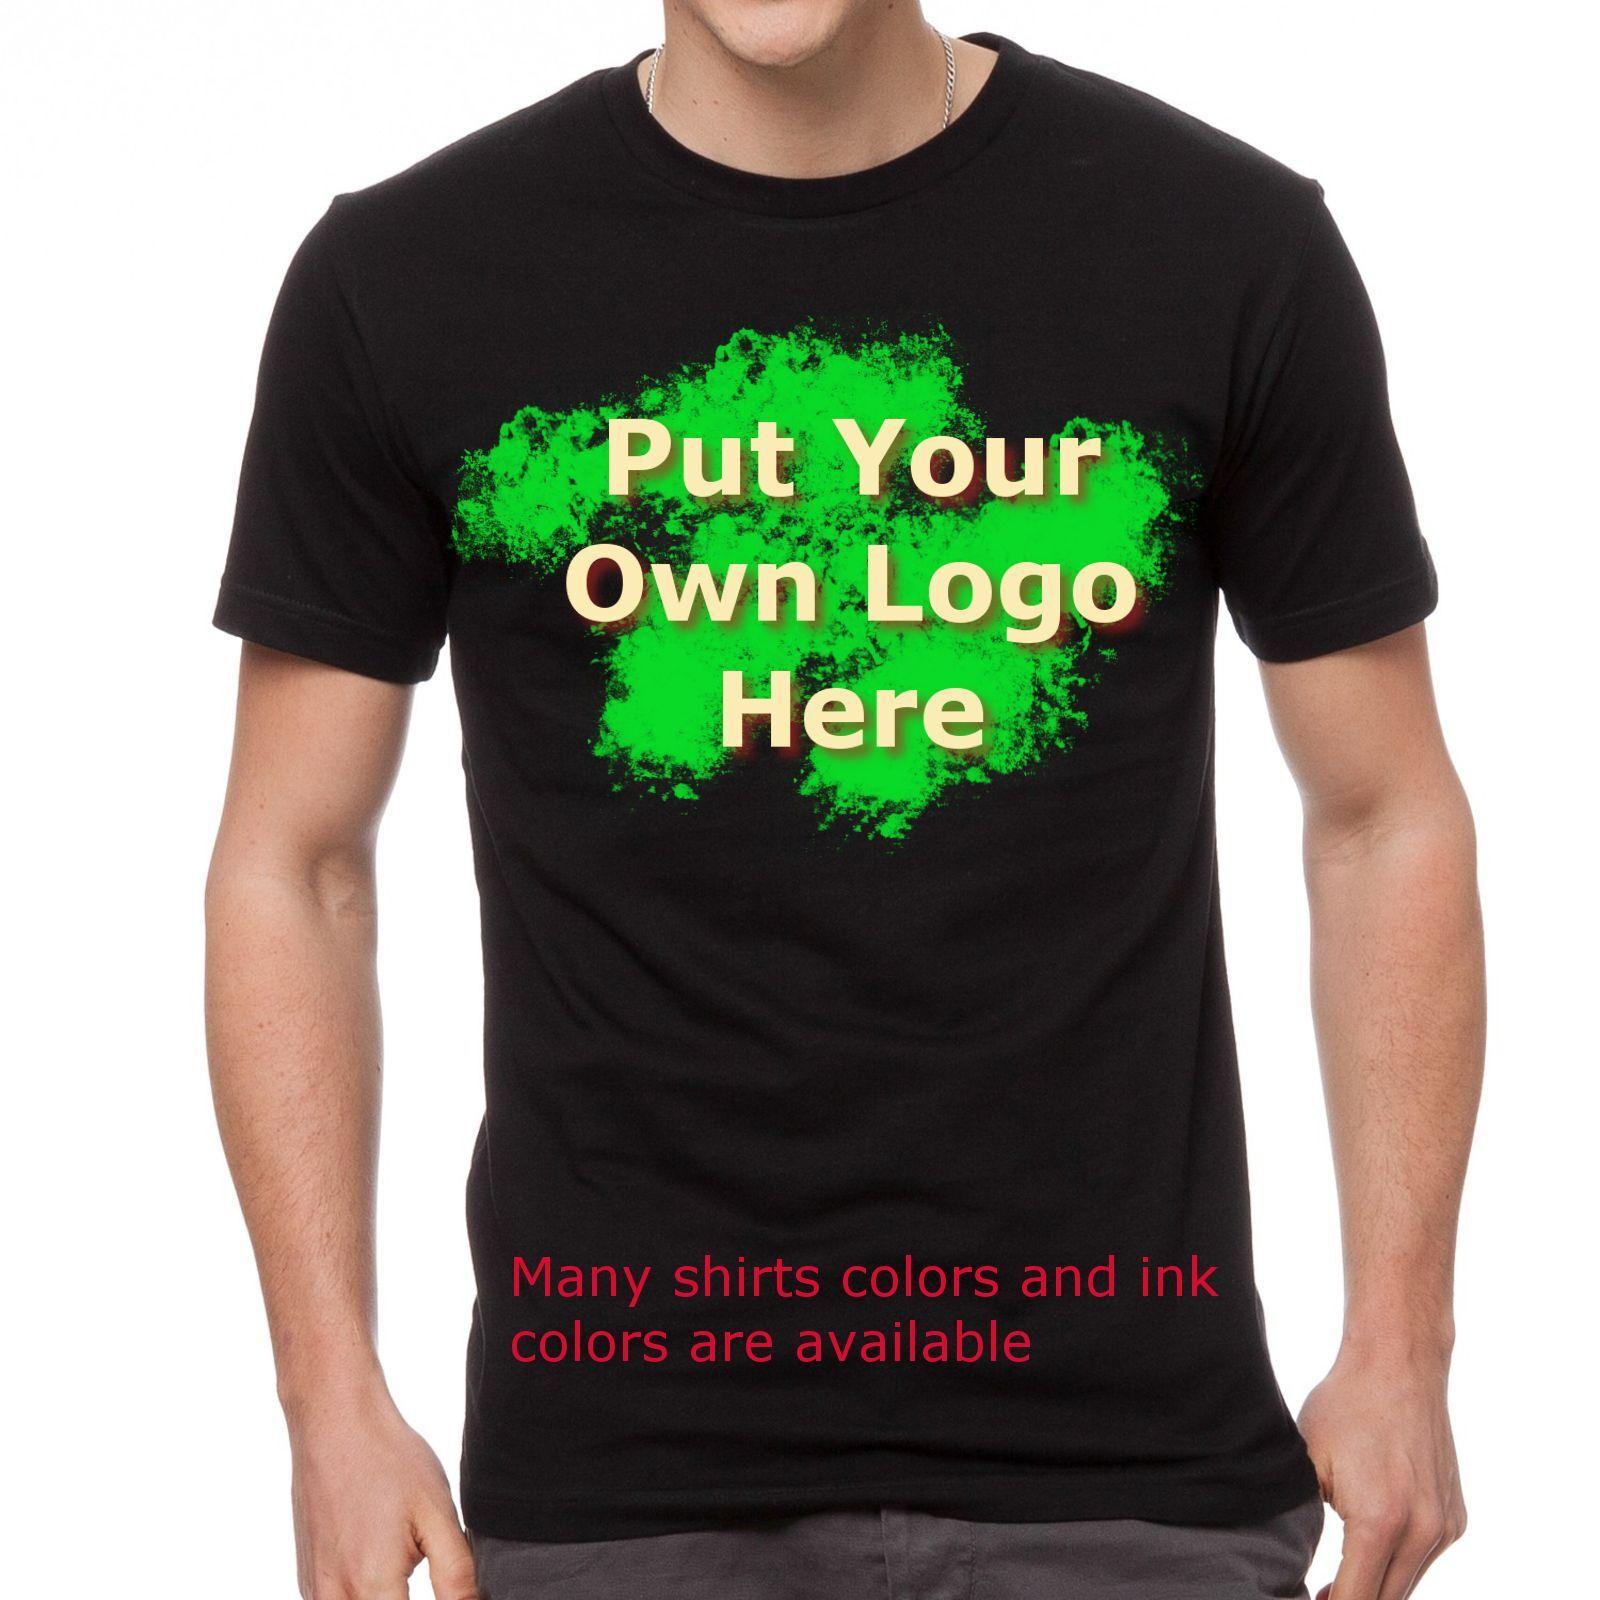 36 Custom Screen Printed Personalized Short Sleeve T-shirts, Gildan Fast Service